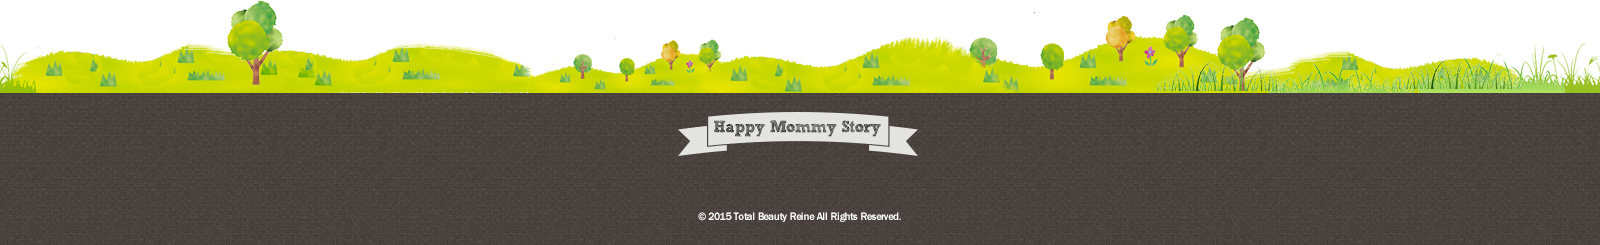 【Happy Mommy Story】はぴます